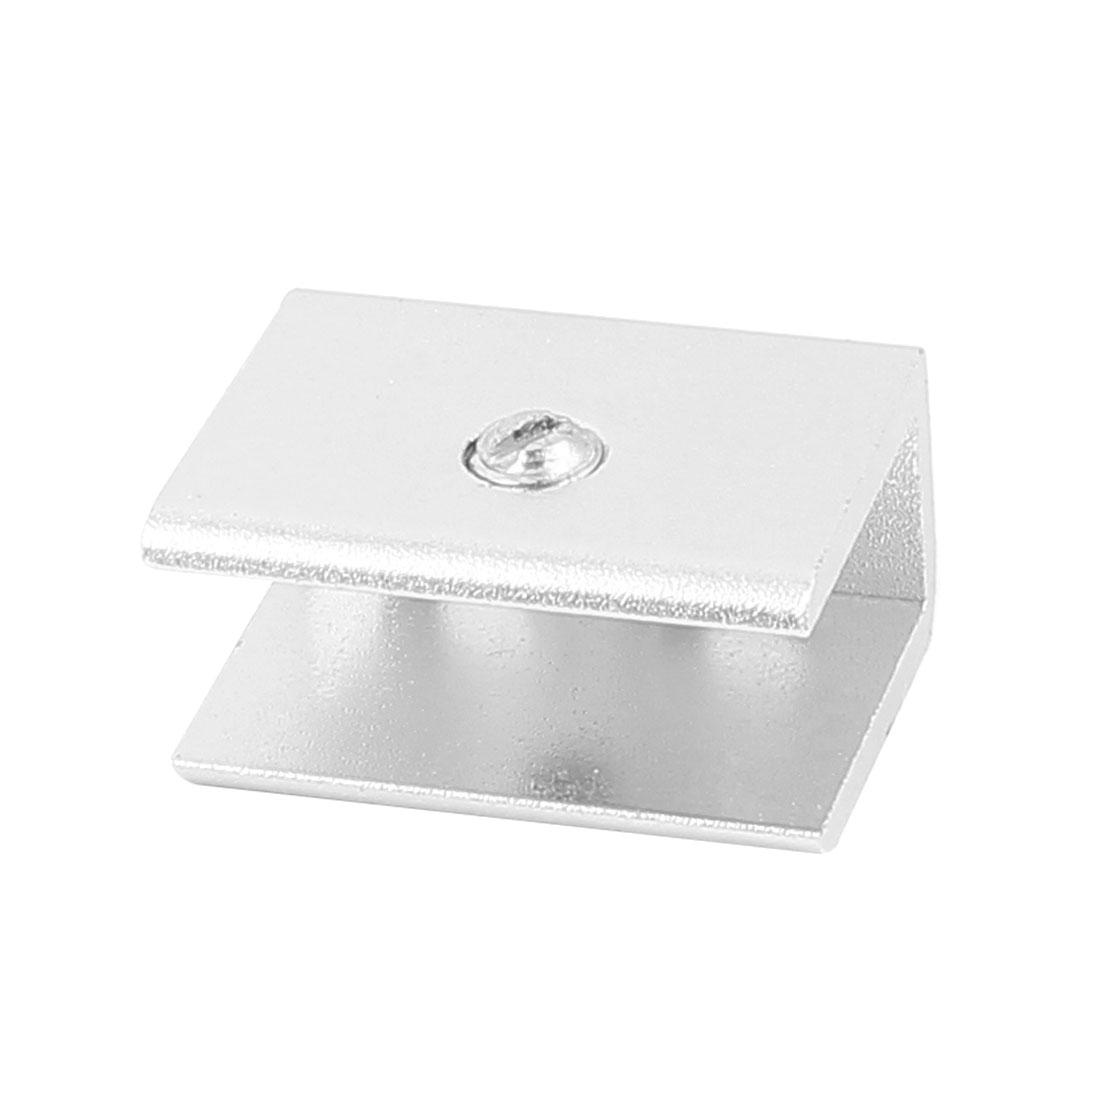 Rectangular Shape Aluminum Glass Clamp Holder Bracket Support Clip w Screws